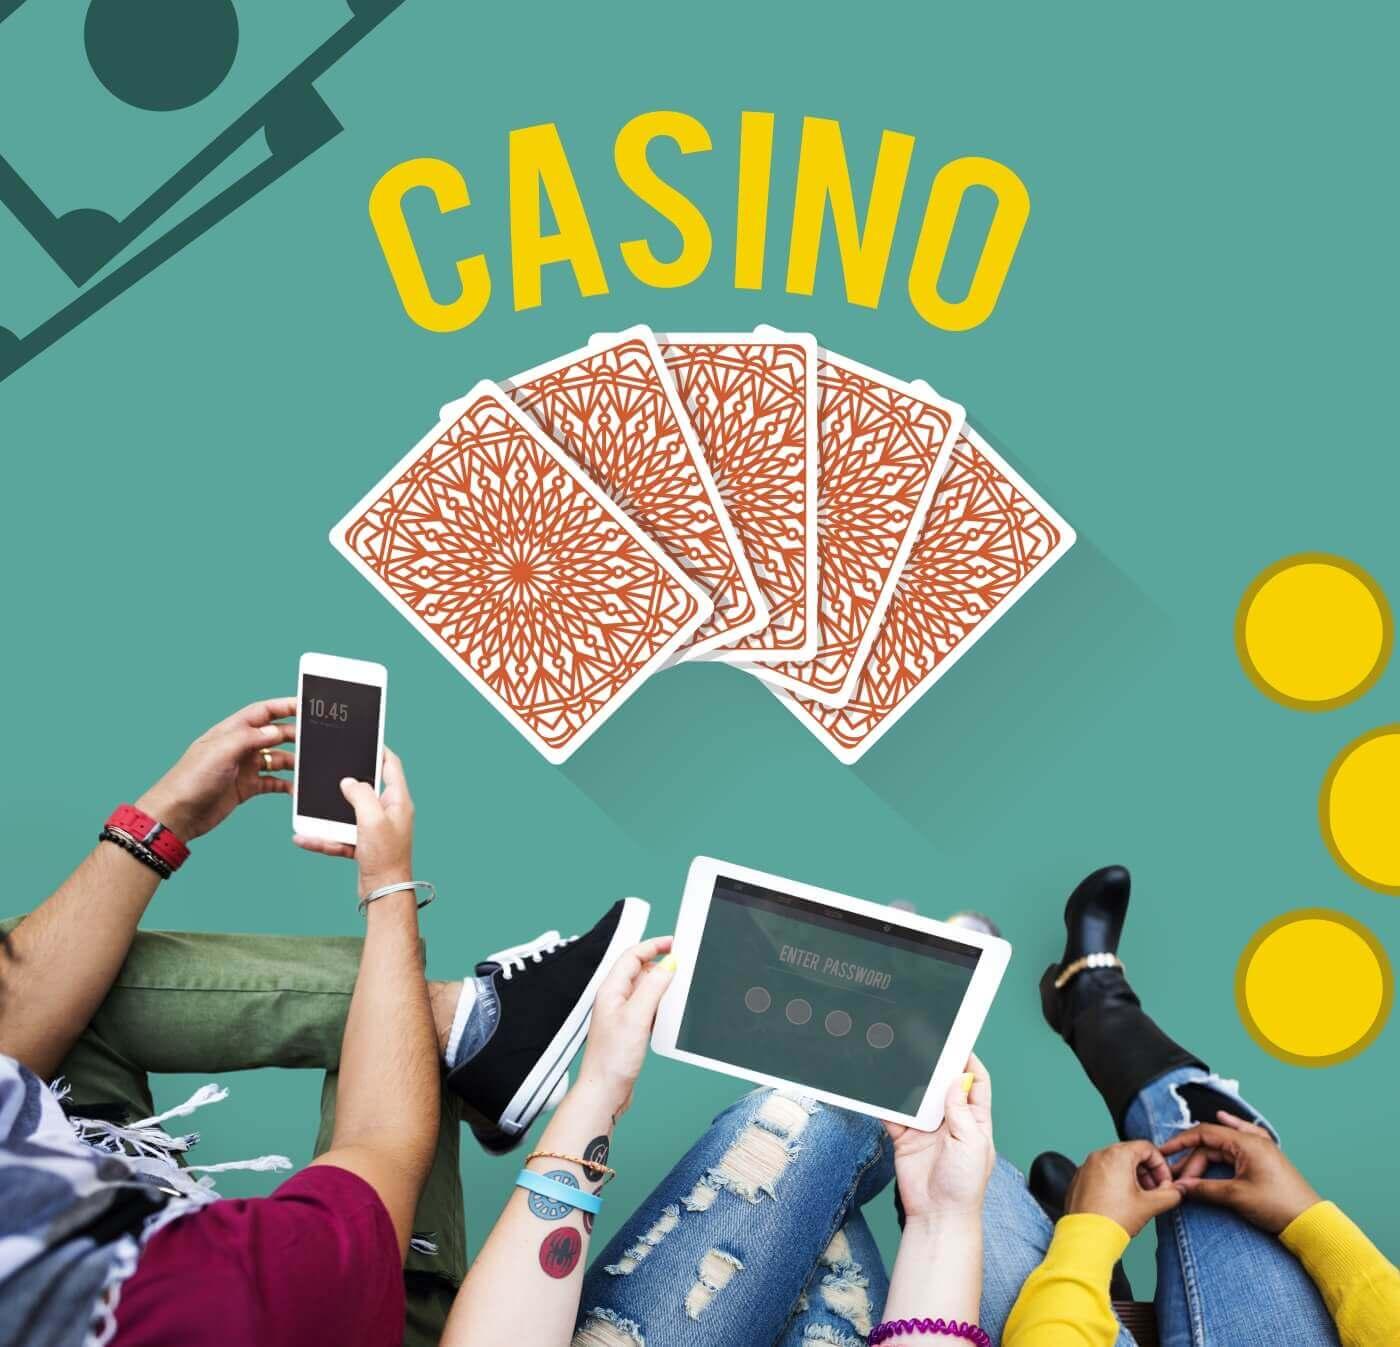 Delaware Online Casinos